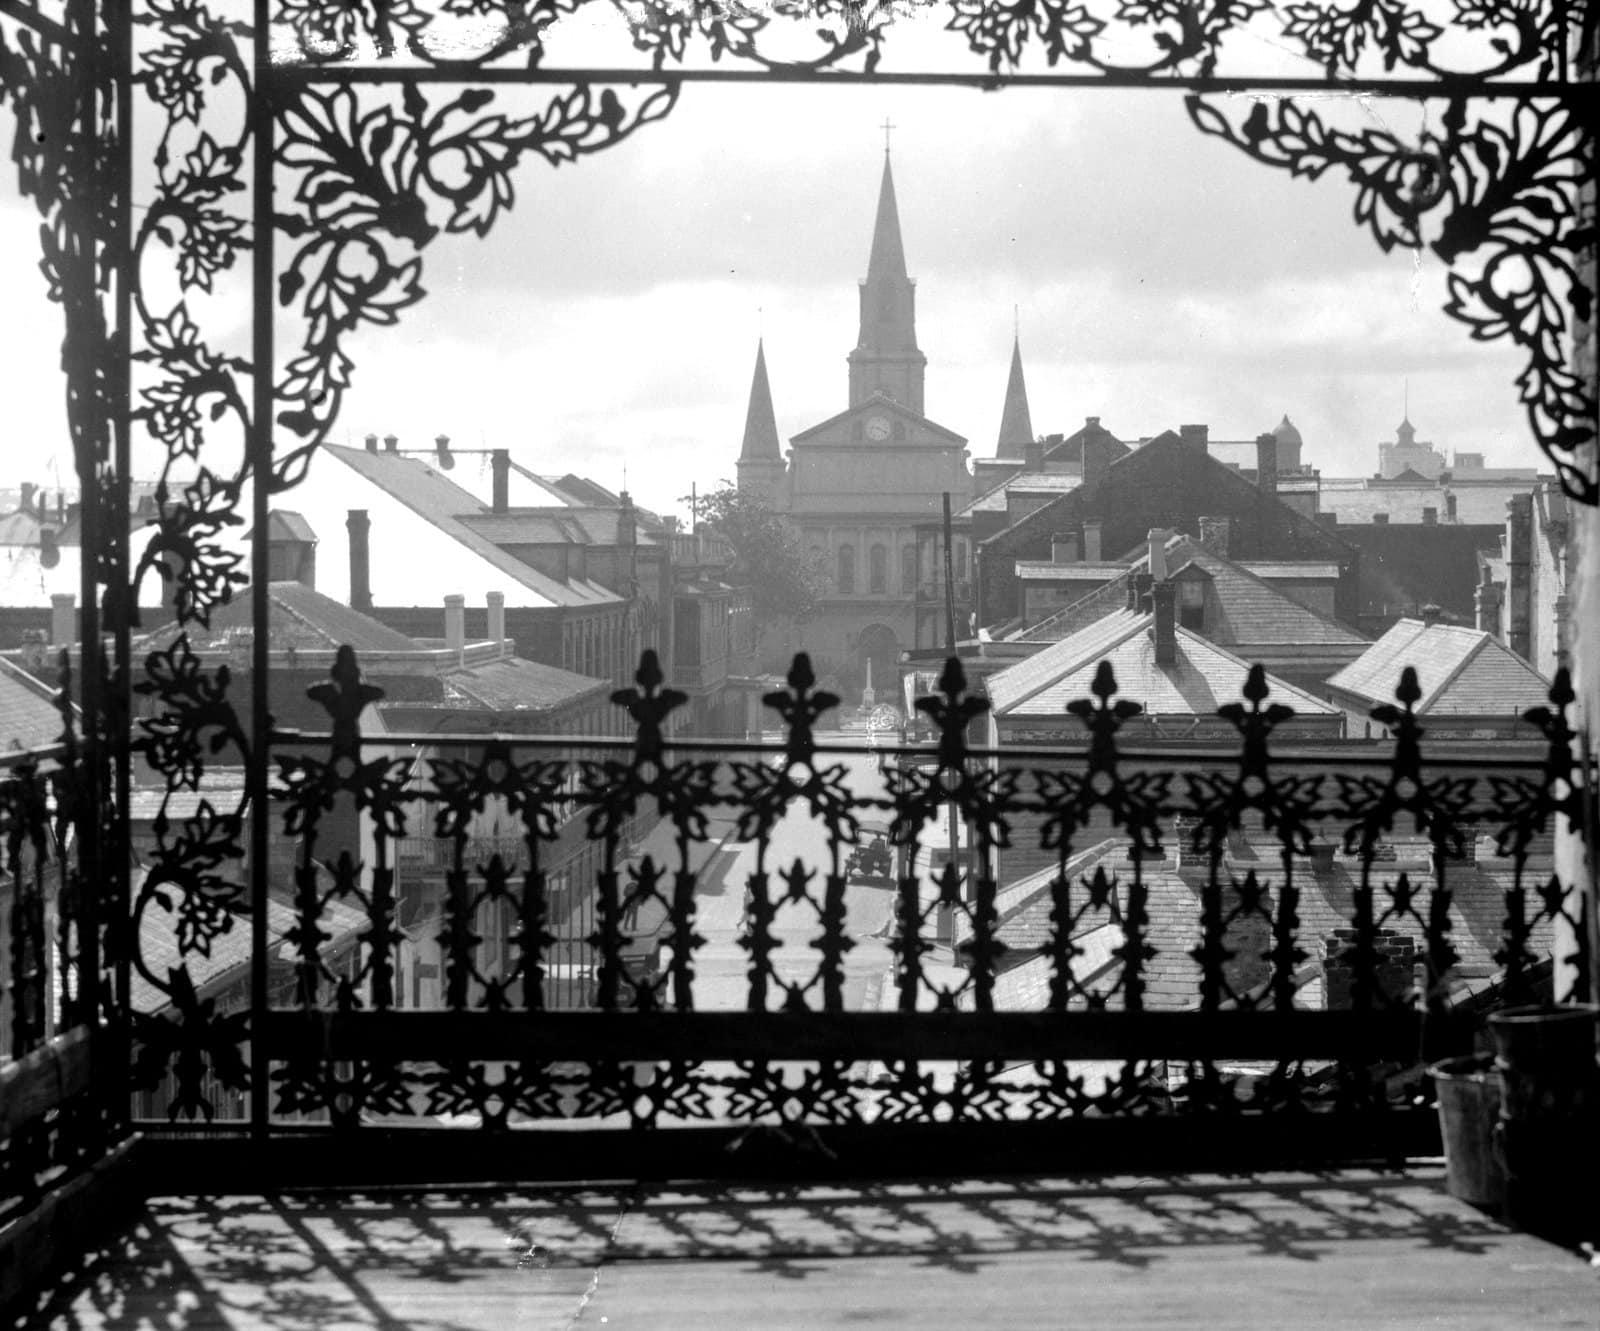 A vista through vintage iron lace, New Orleans (1920)